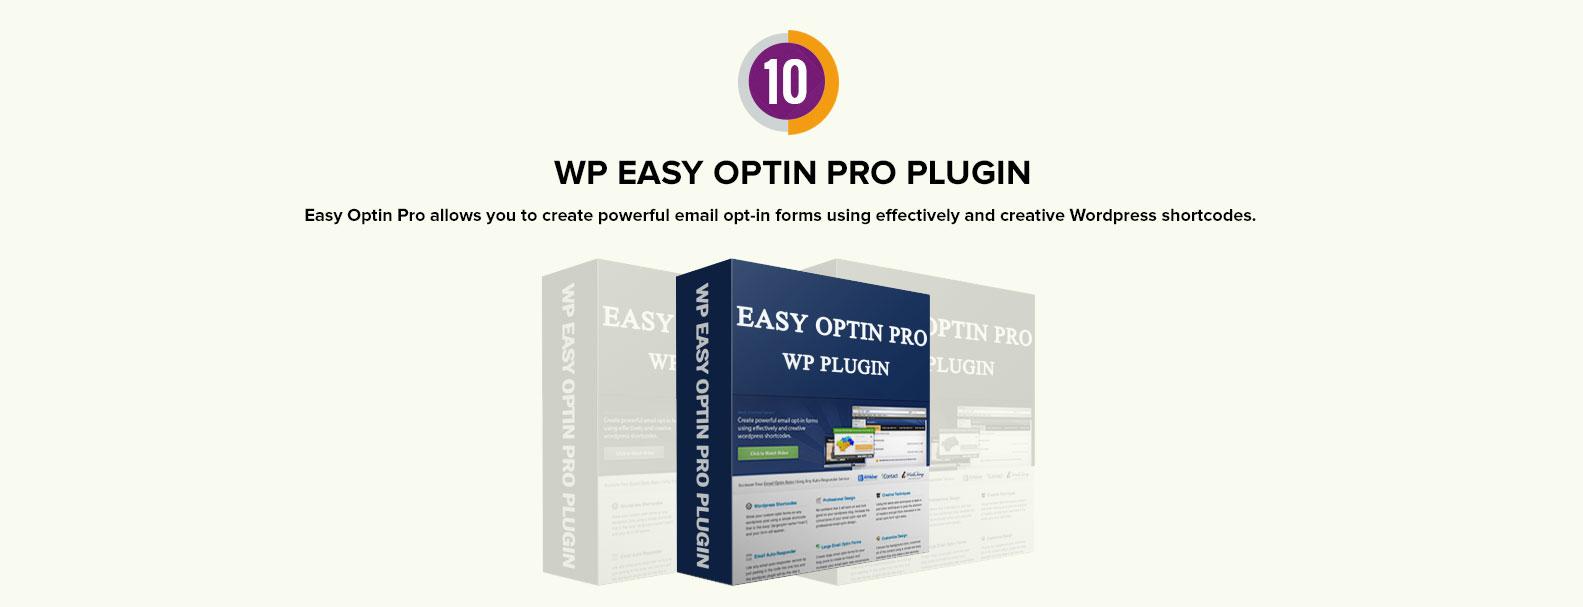 wp easy optin pro plugin